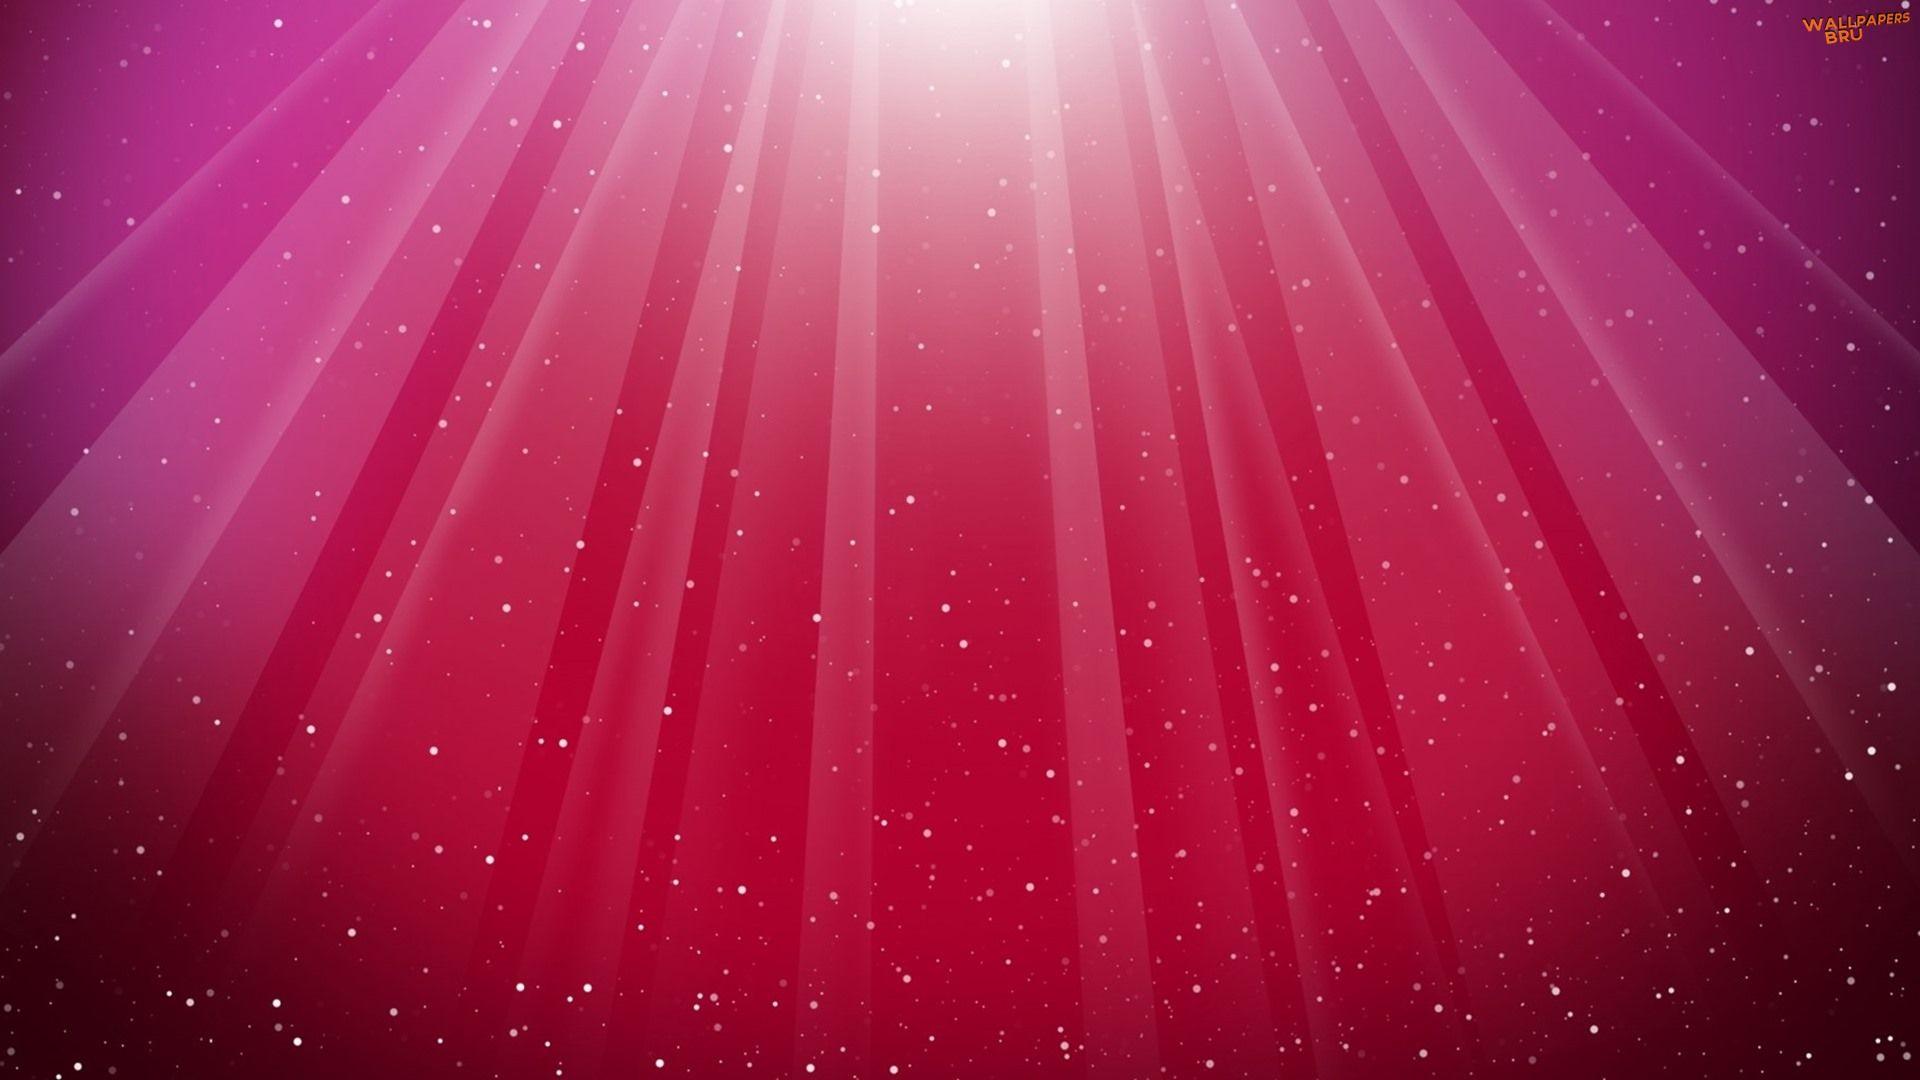 Shiny desktop wallpaper download